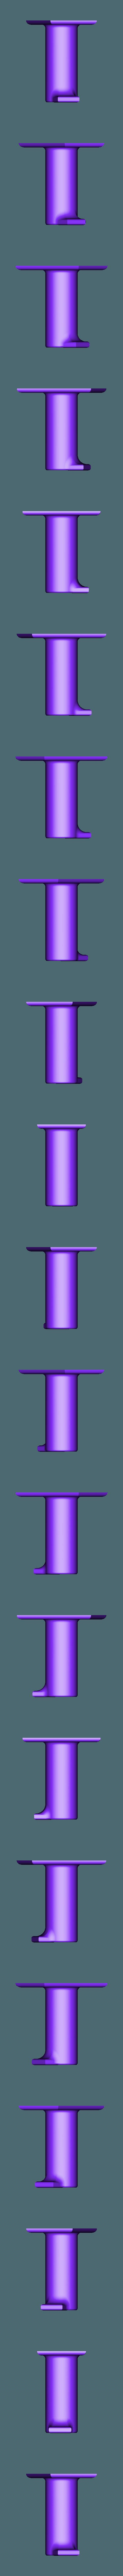 Spool Holder.stl Download free STL file Small Spool holder for 10m Filament • 3D printing object, jaxi666